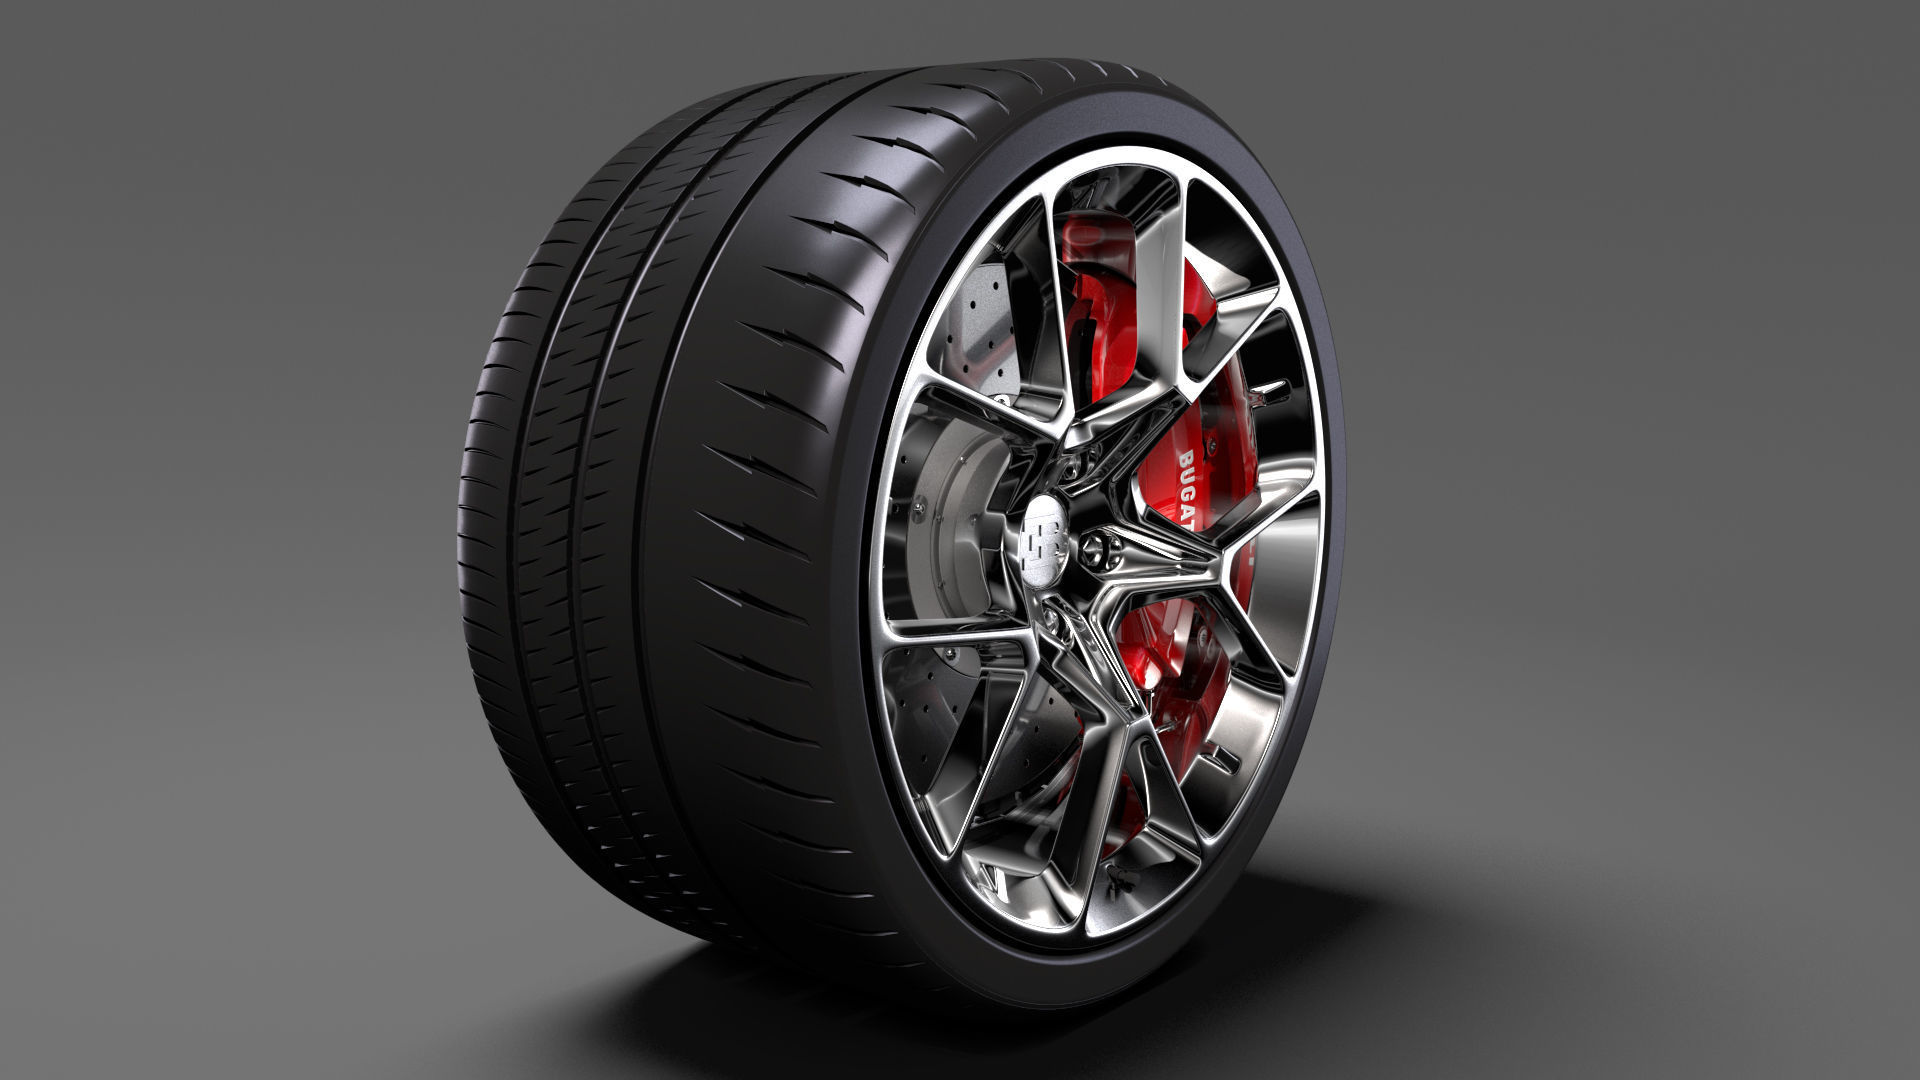 Bugatti Chiron wheel 4